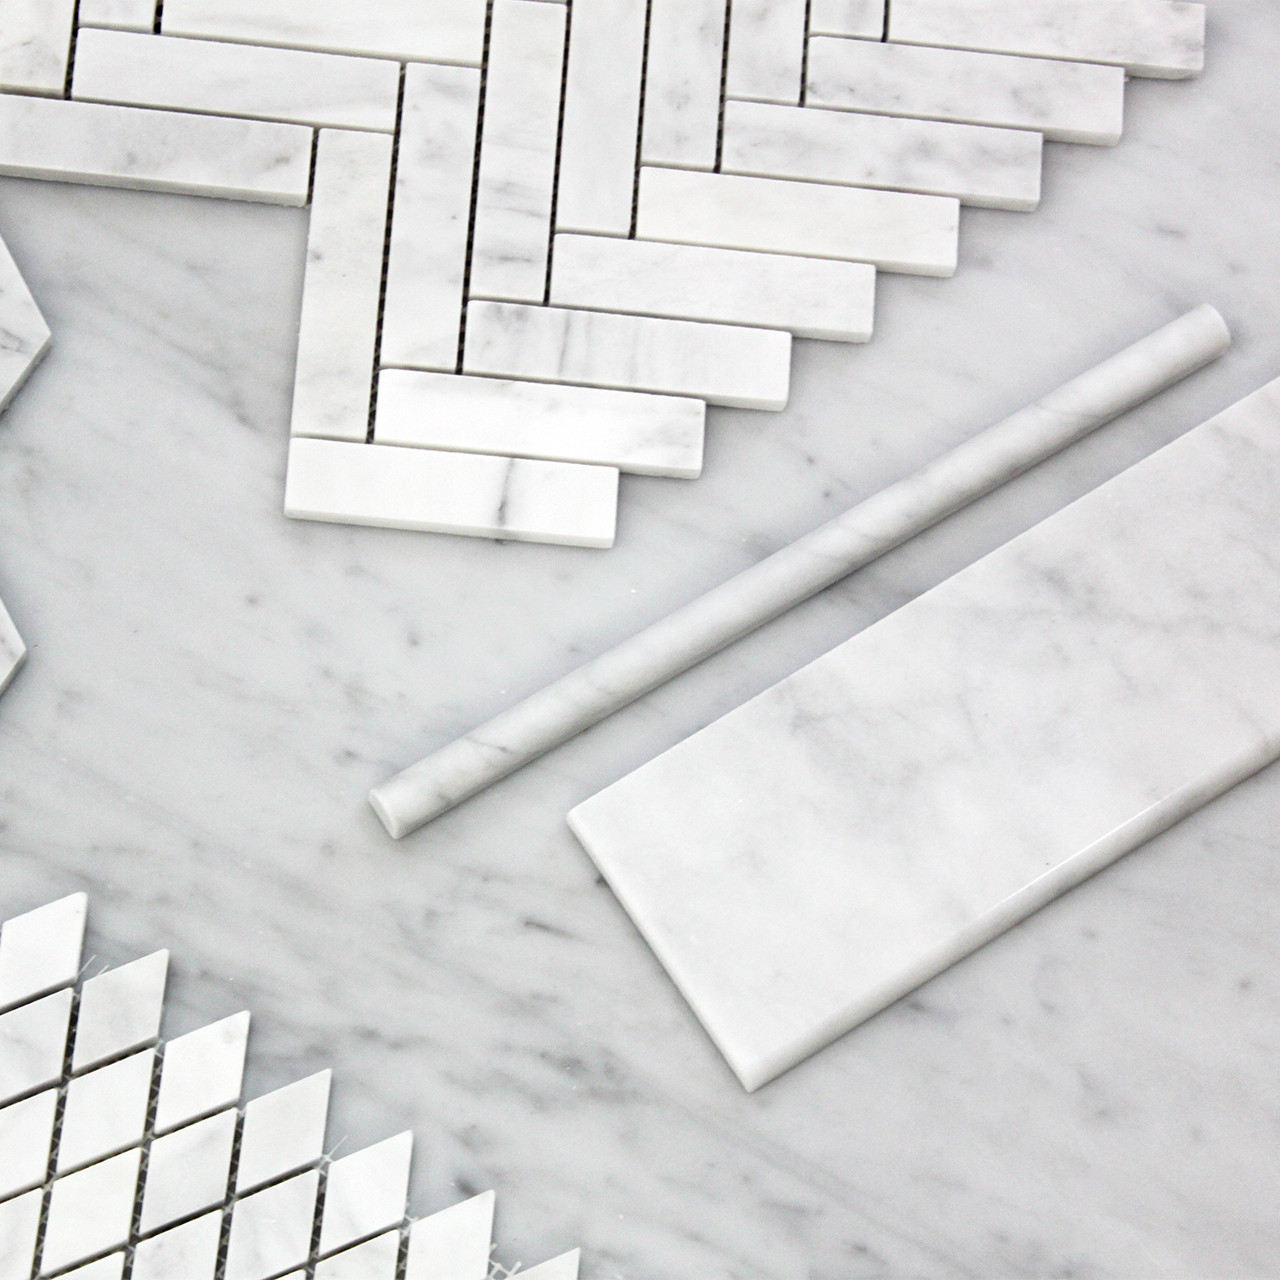 carrara marble bullnose pencil molding